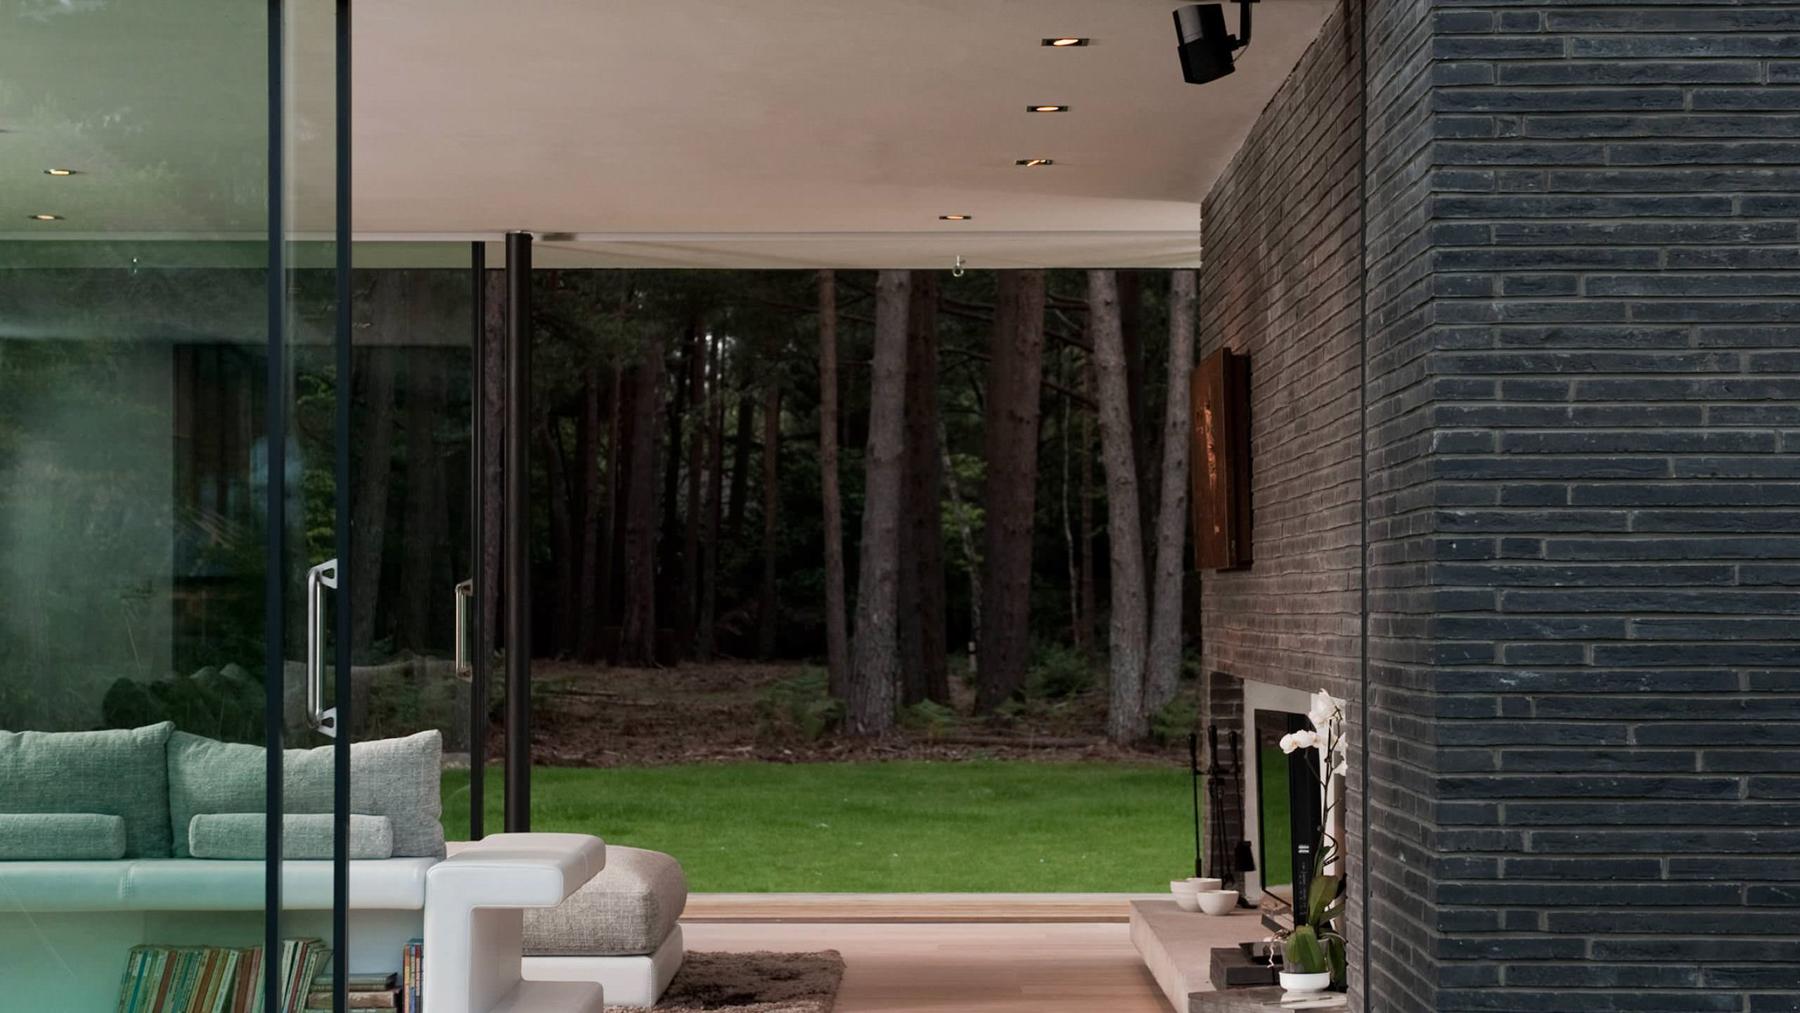 CroppedFocusedImage25601440-Strom-Architects-Watson-8.jpg